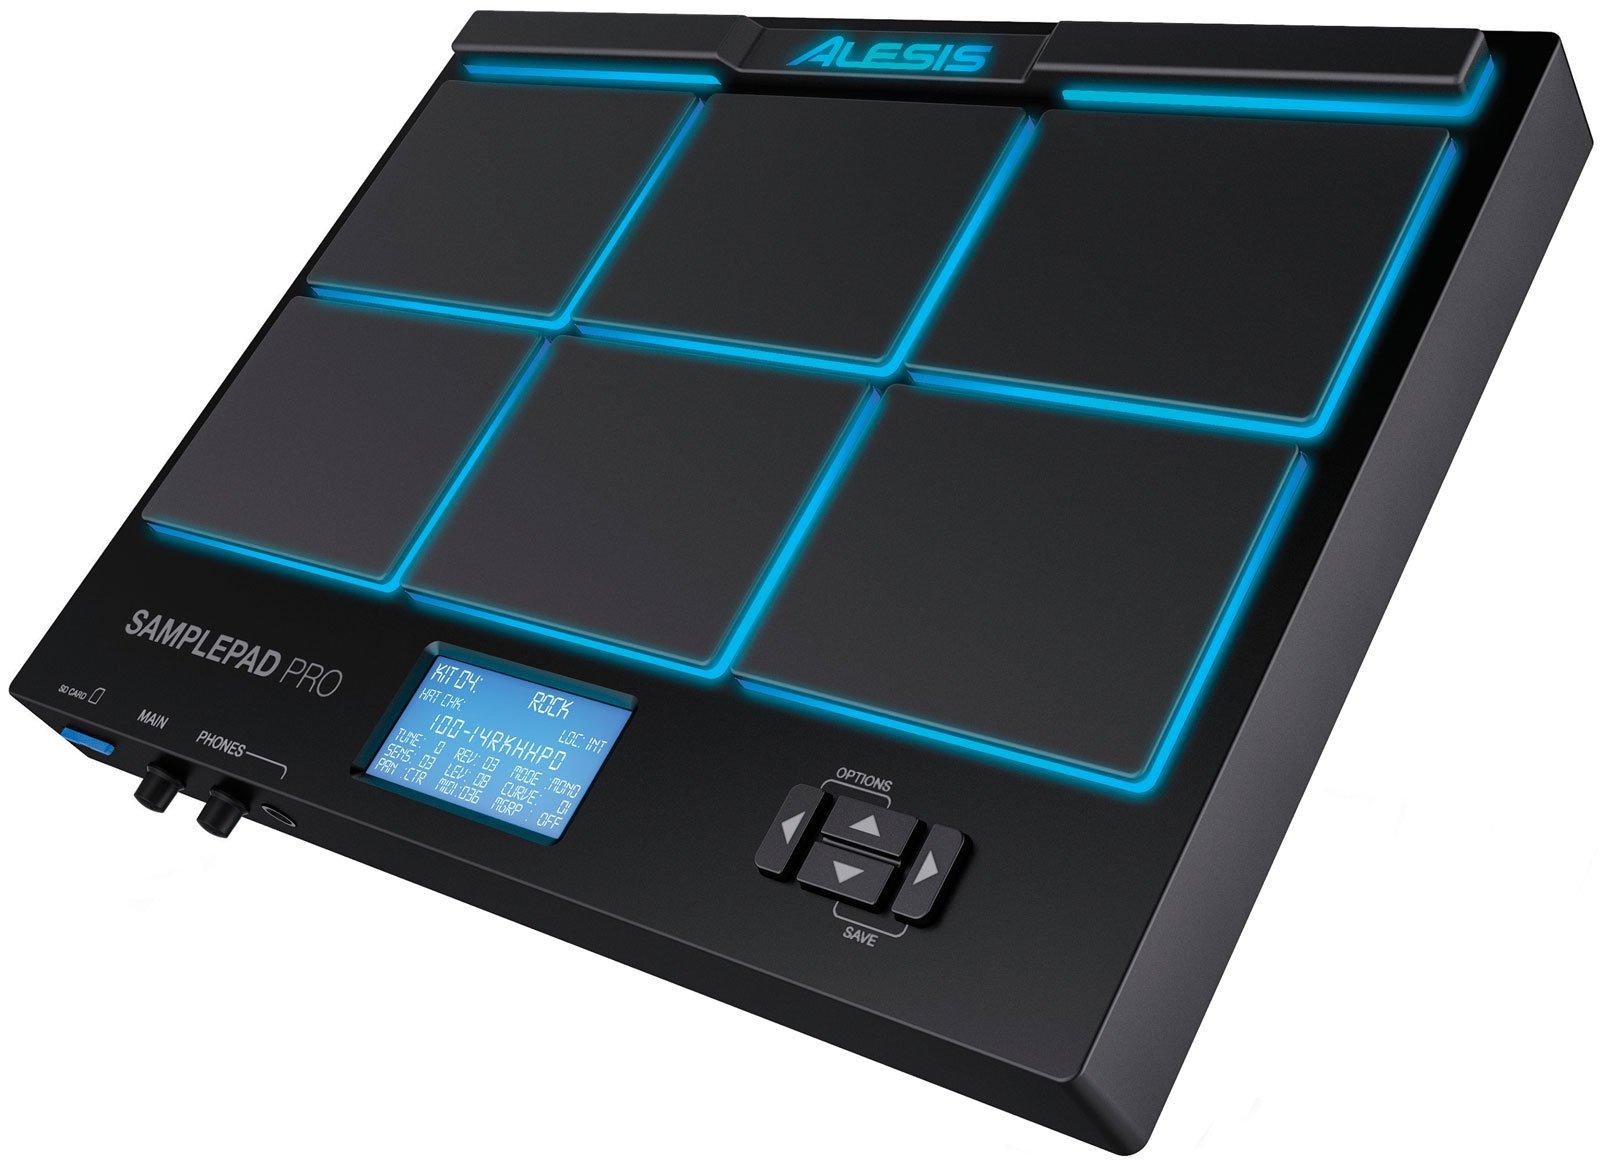 Alesis Sample Pad Pro Drum Pad